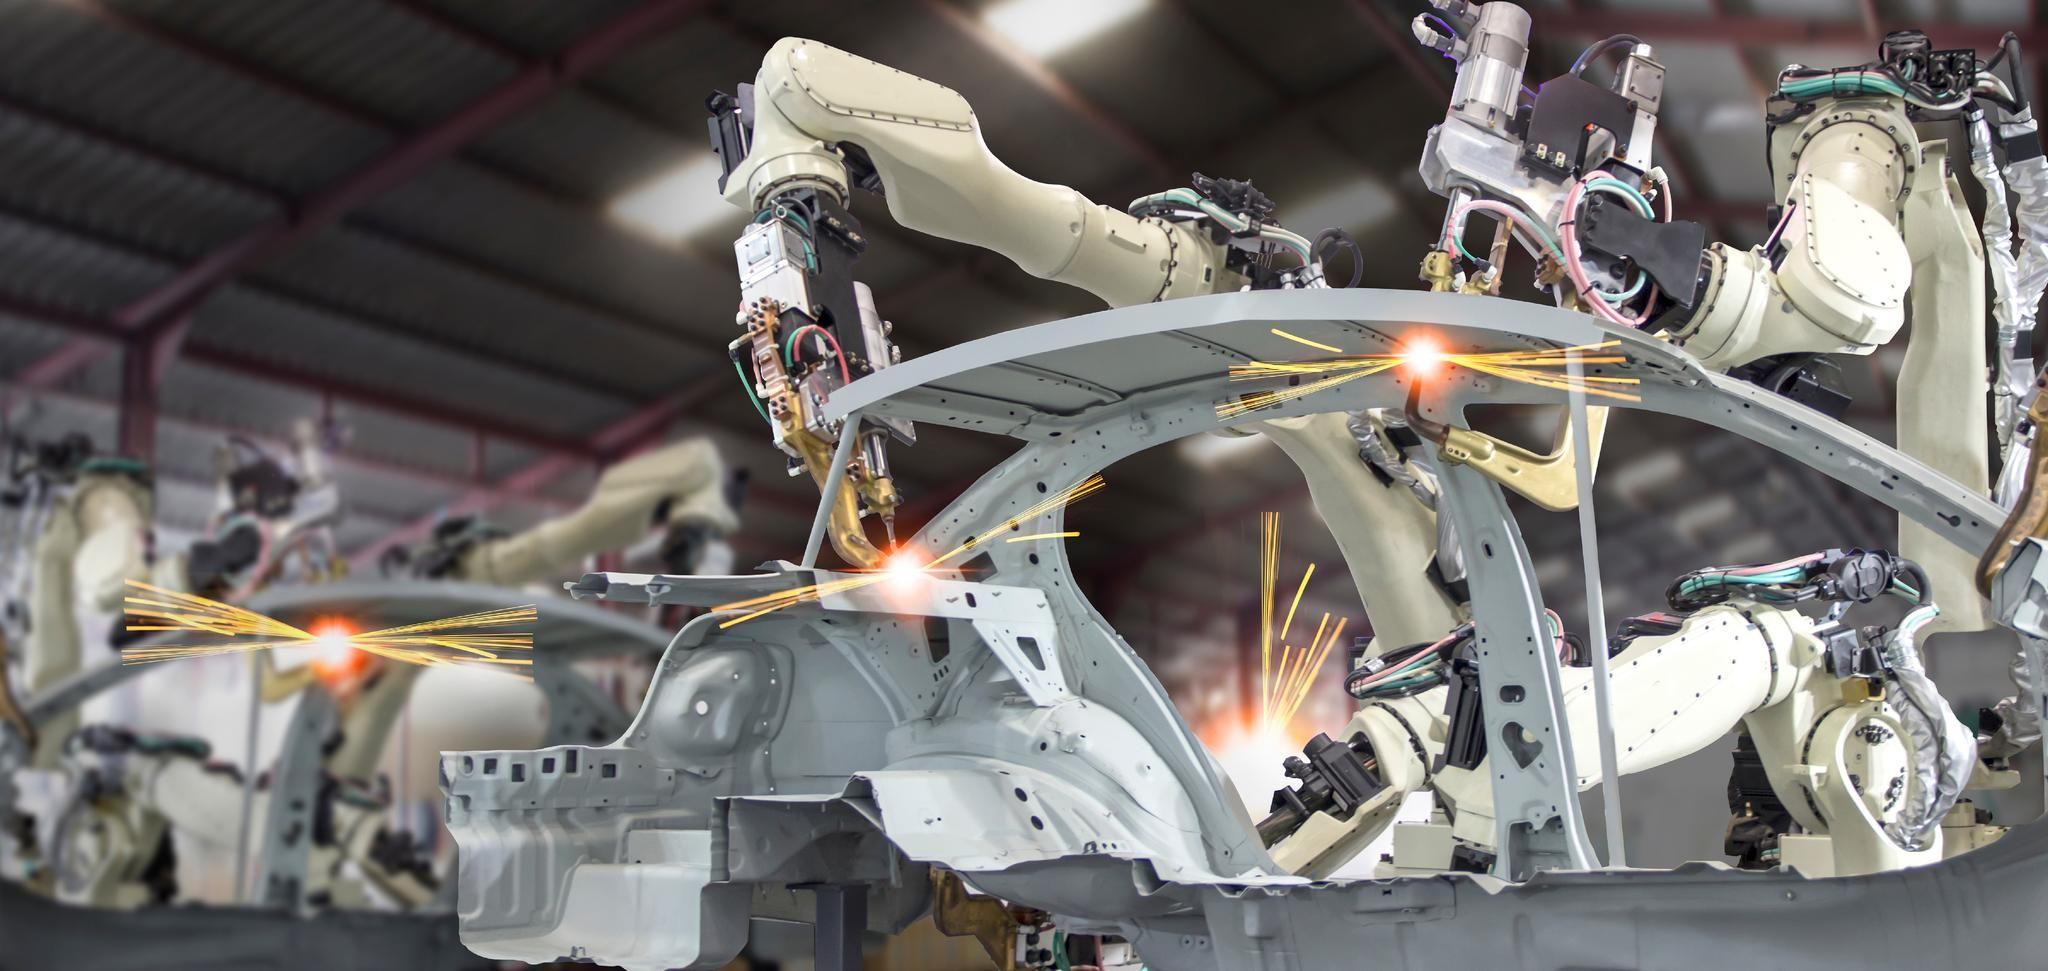 Automotive Supply Chain - Automechanika Birmingham 2021 ...